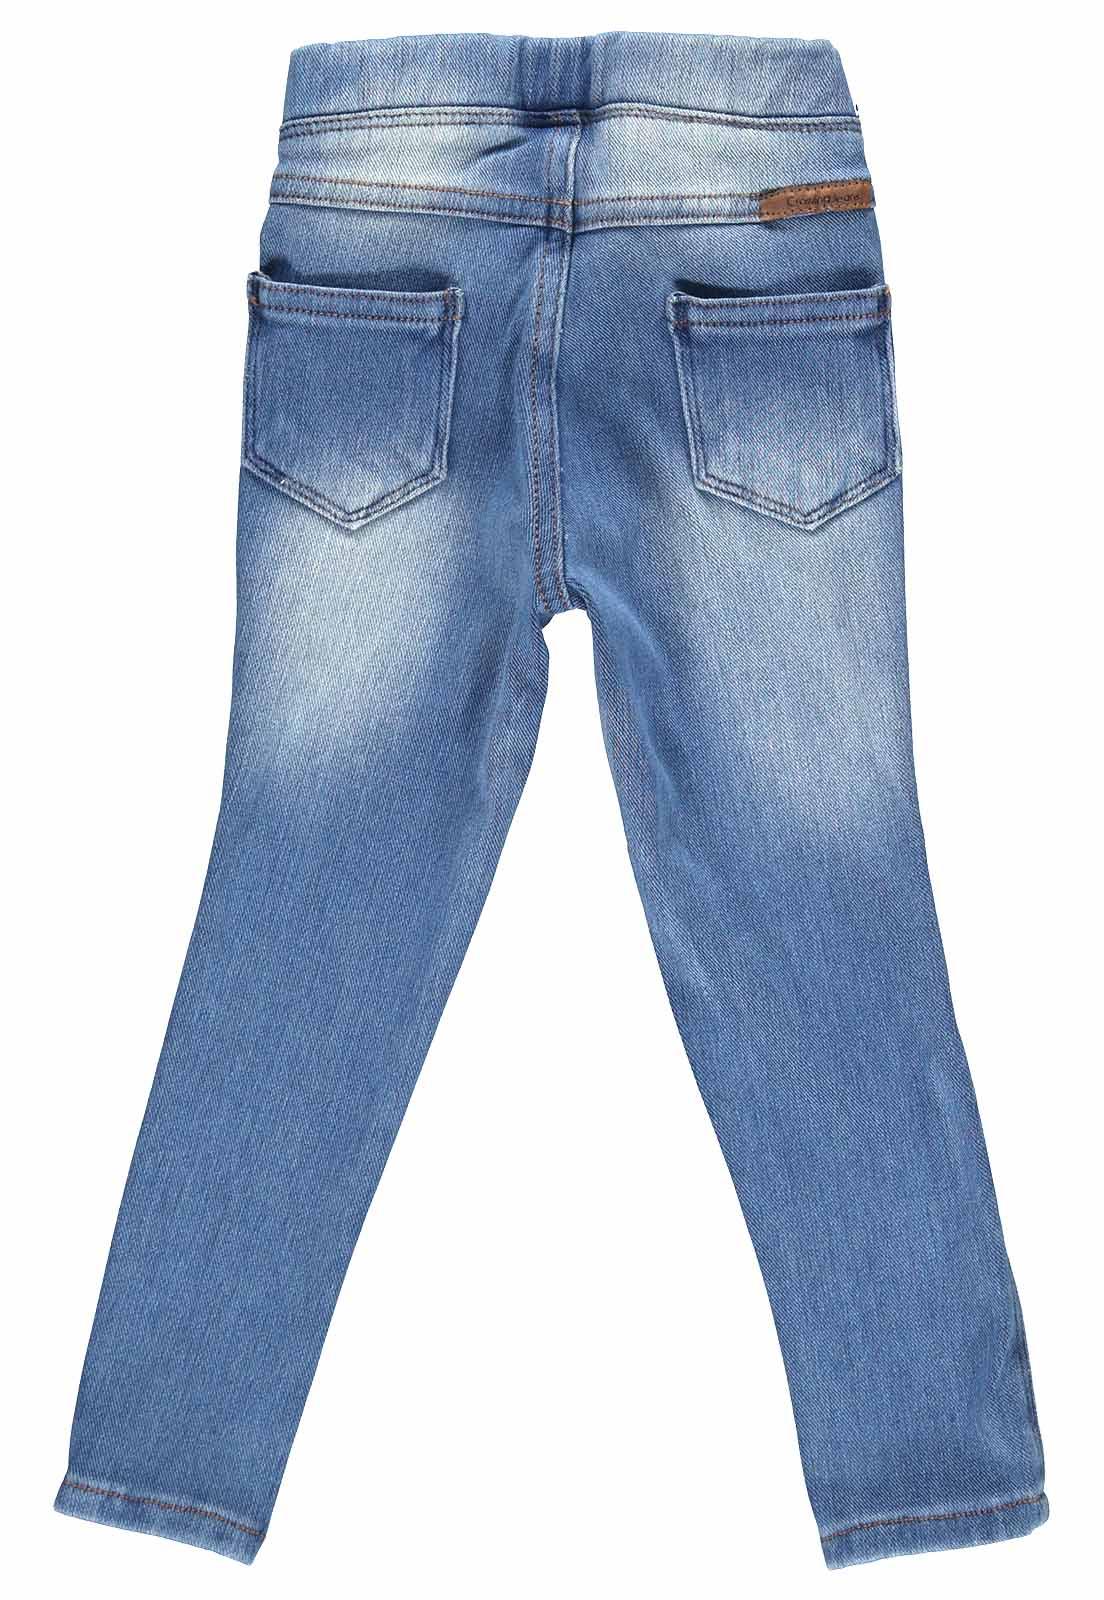 Calça Feminina Jegging Crawling Jeans Moletom